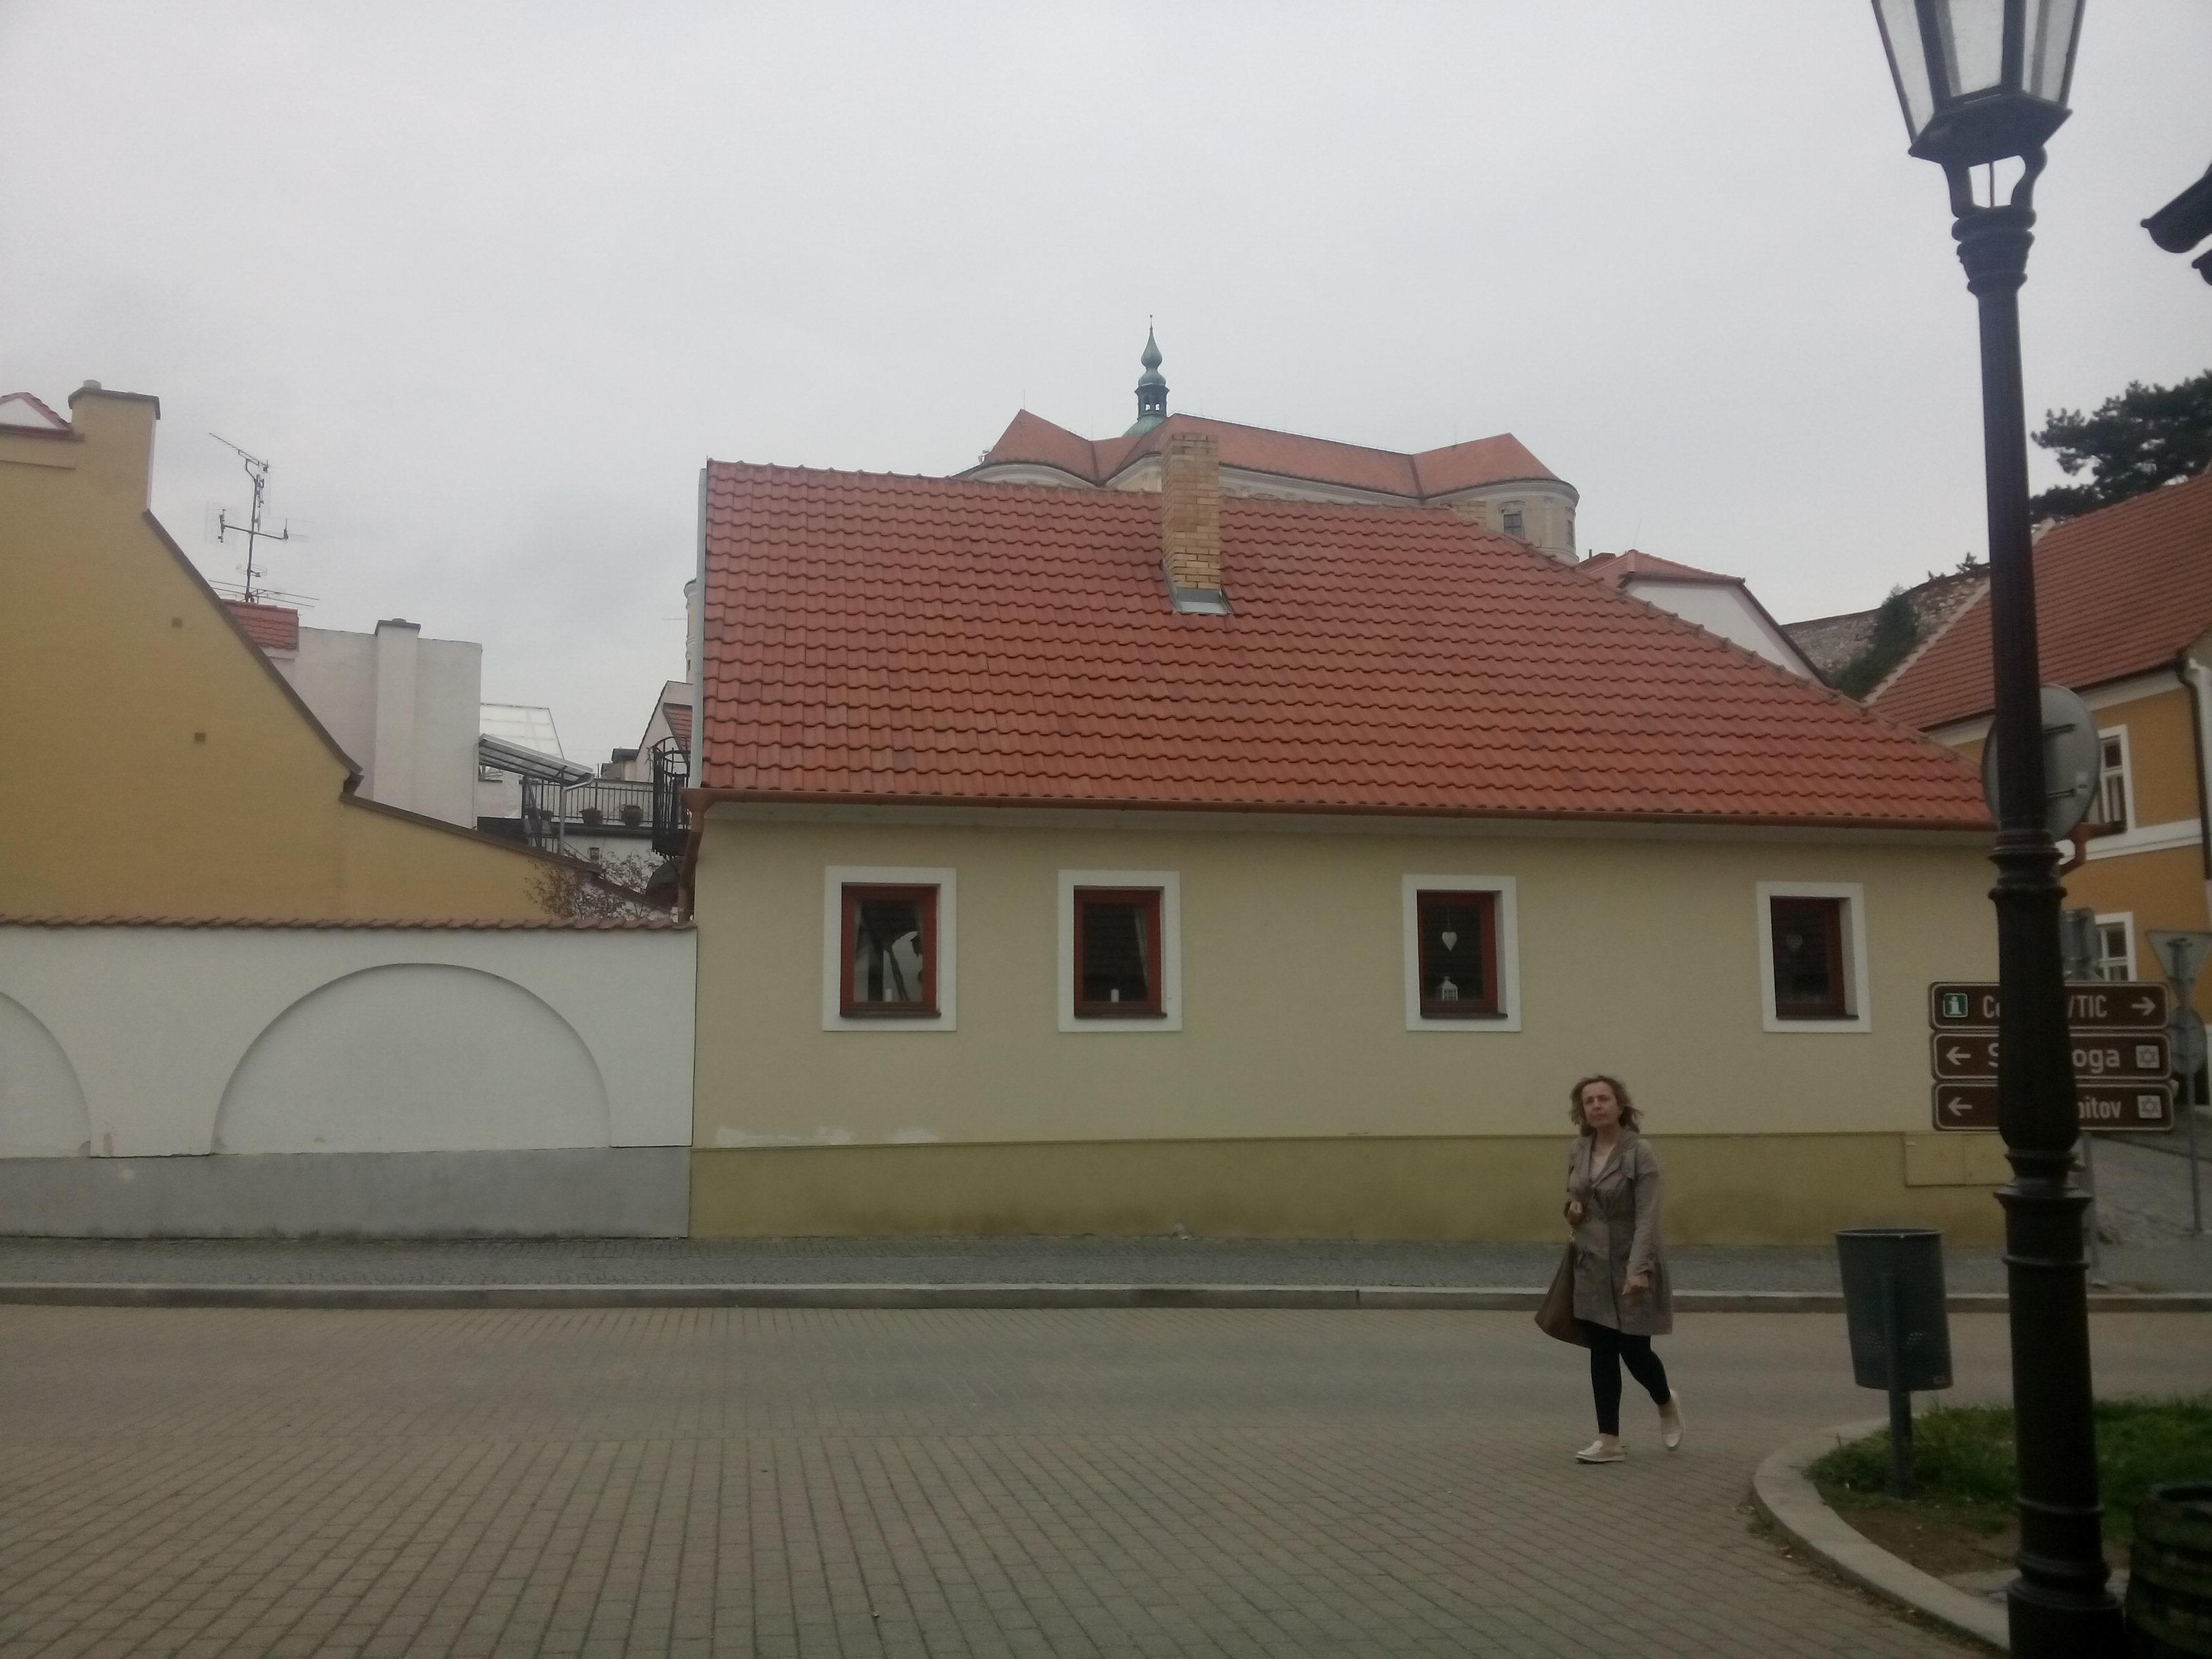 https://i.amy.gy/201804-slovakia-austria-czech/IMG_20180416_144335.jpg